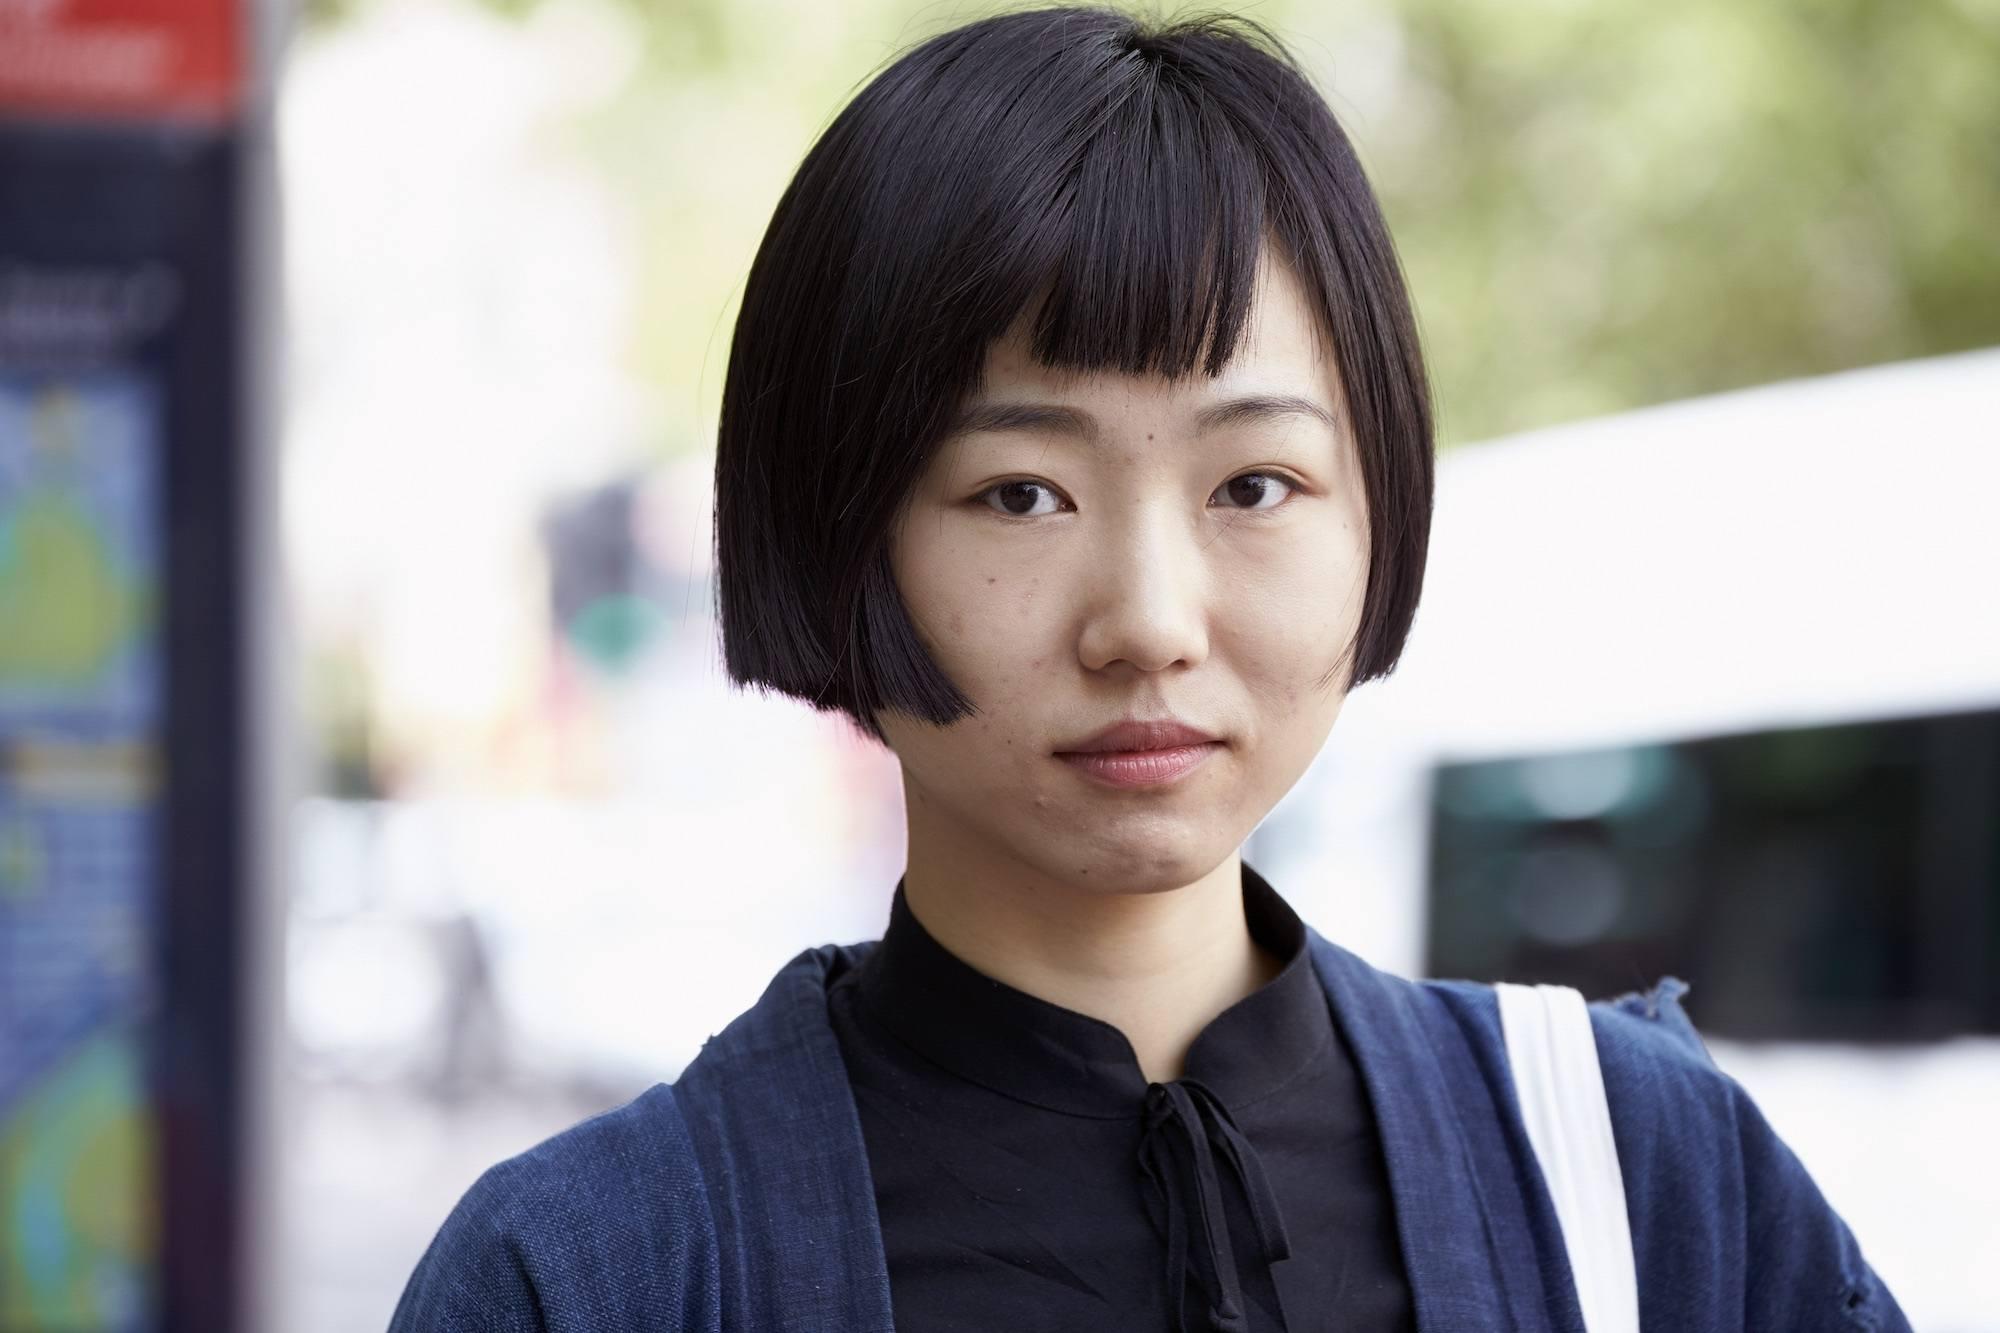 Model rambut pendek untuk wajah bulat dengan warna hitam